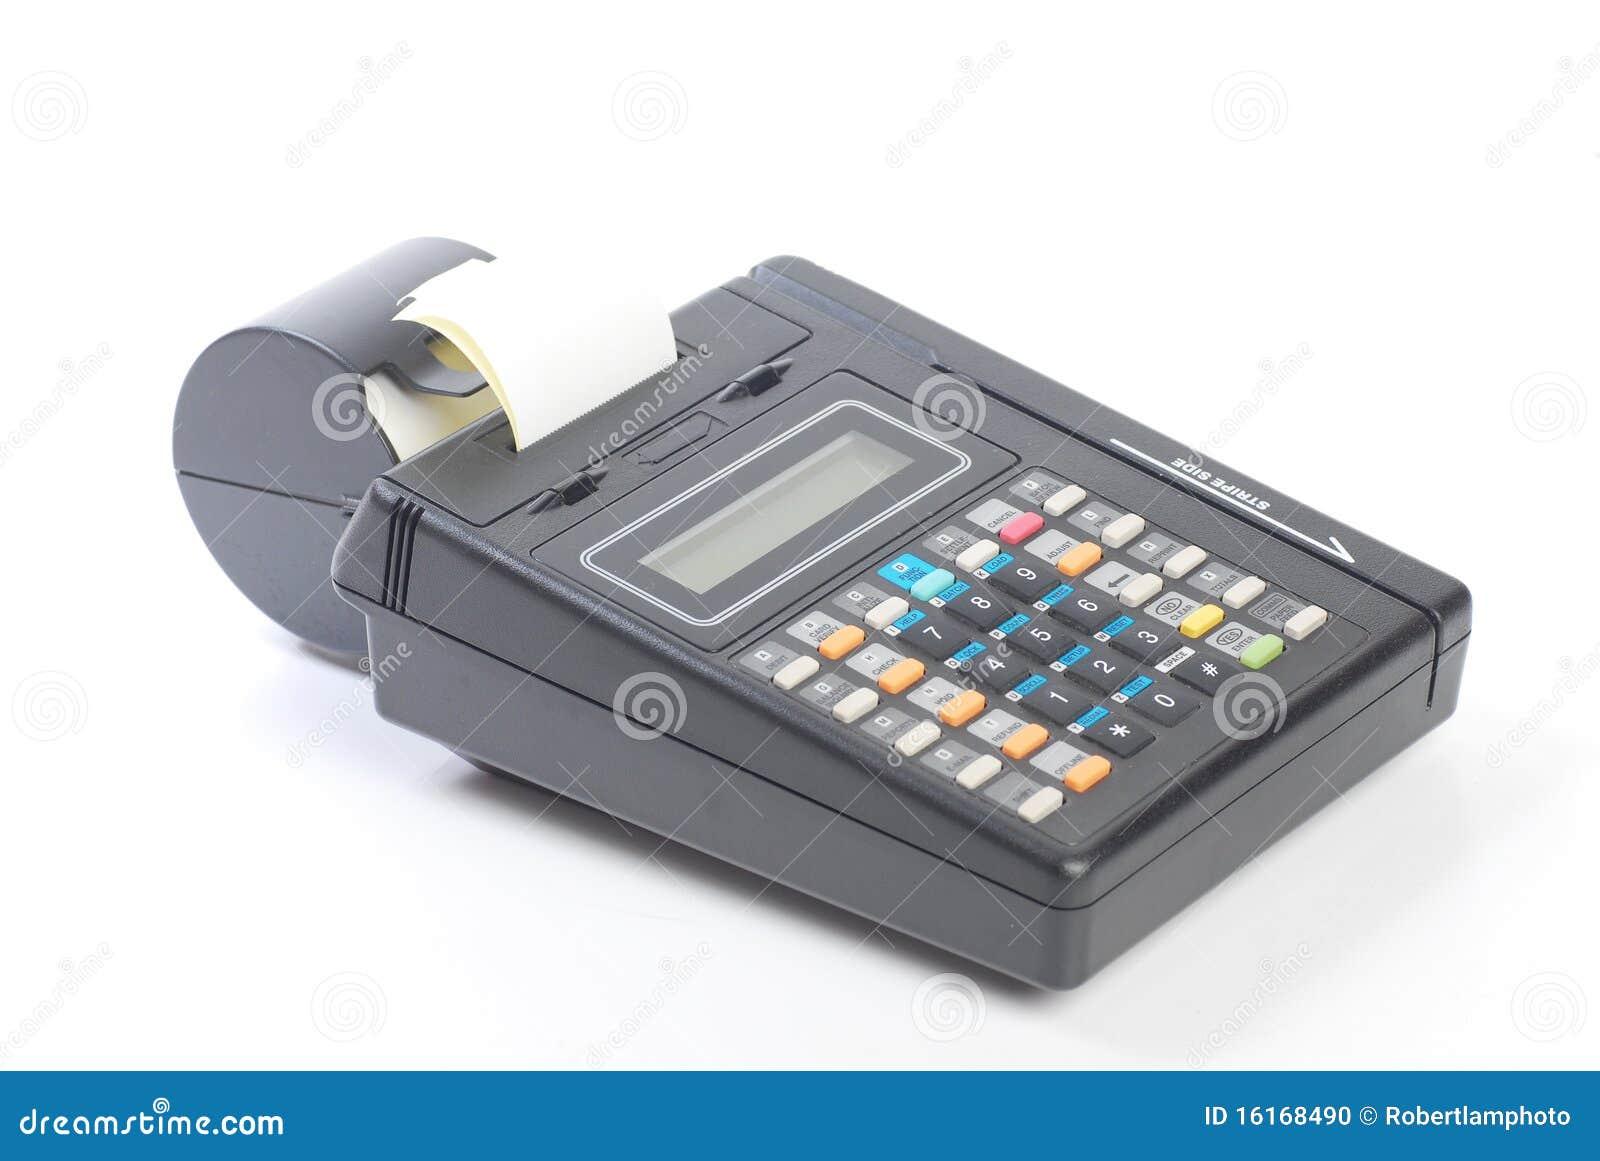 Cash On Credit Card Machine Stock Photo - Image: 16168490